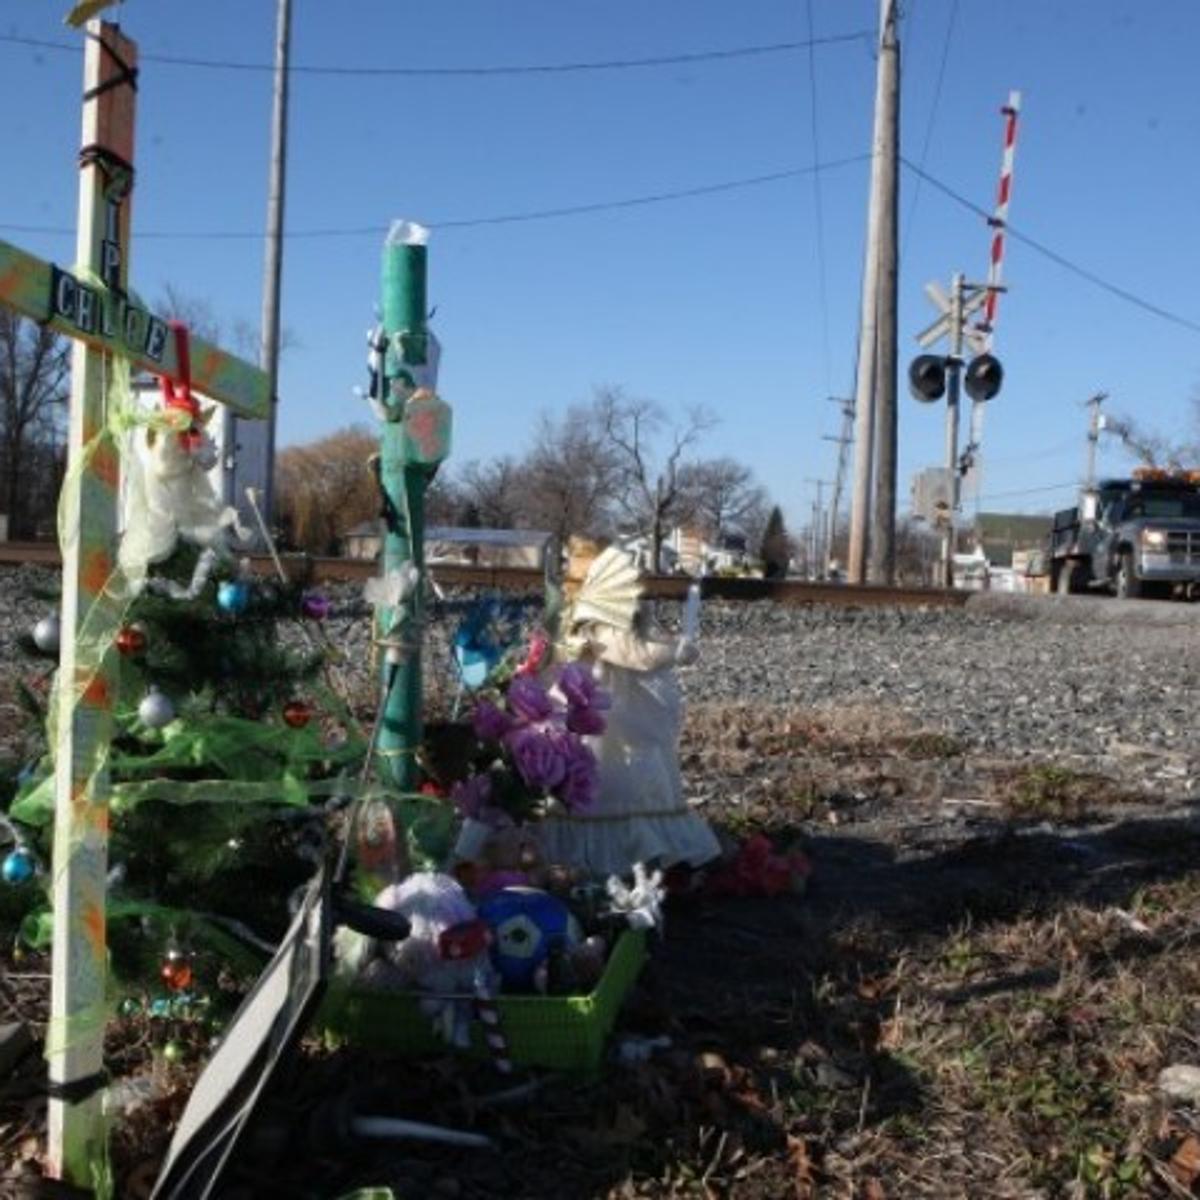 Walking on railroad tracks dangerous, illegal | Gary News